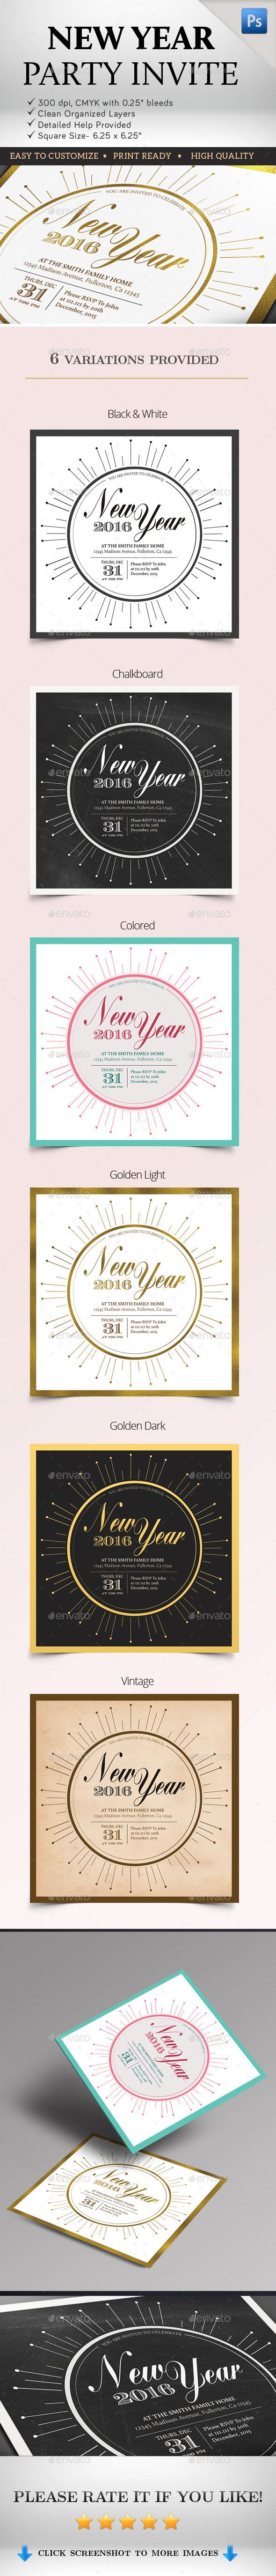 New Year Party Invites - Invitations Cards & Invites